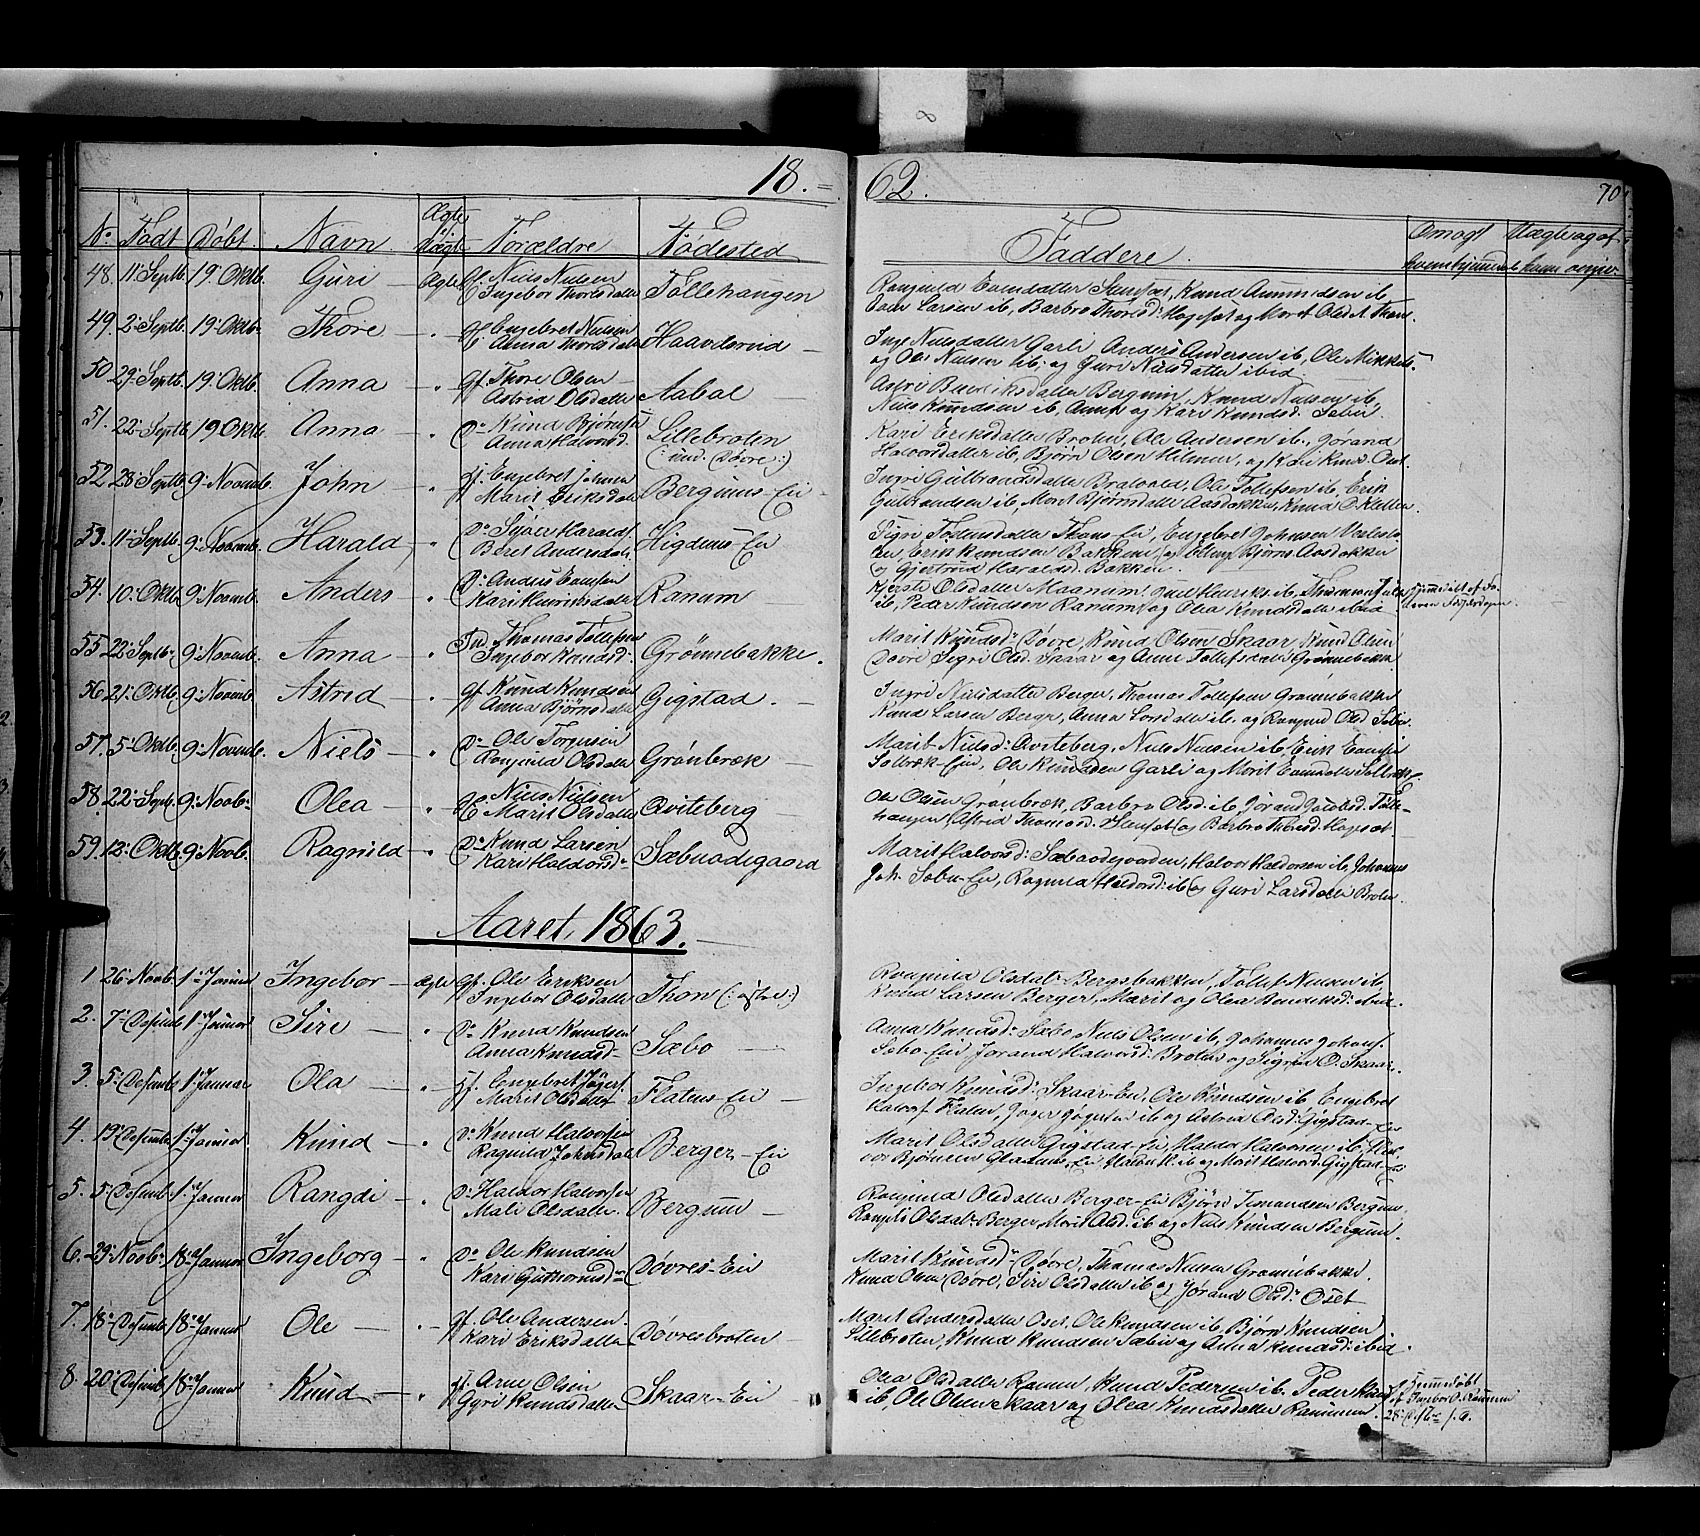 SAH, Nord-Aurdal prestekontor, Ministerialbok nr. 7, 1842-1863, s. 70